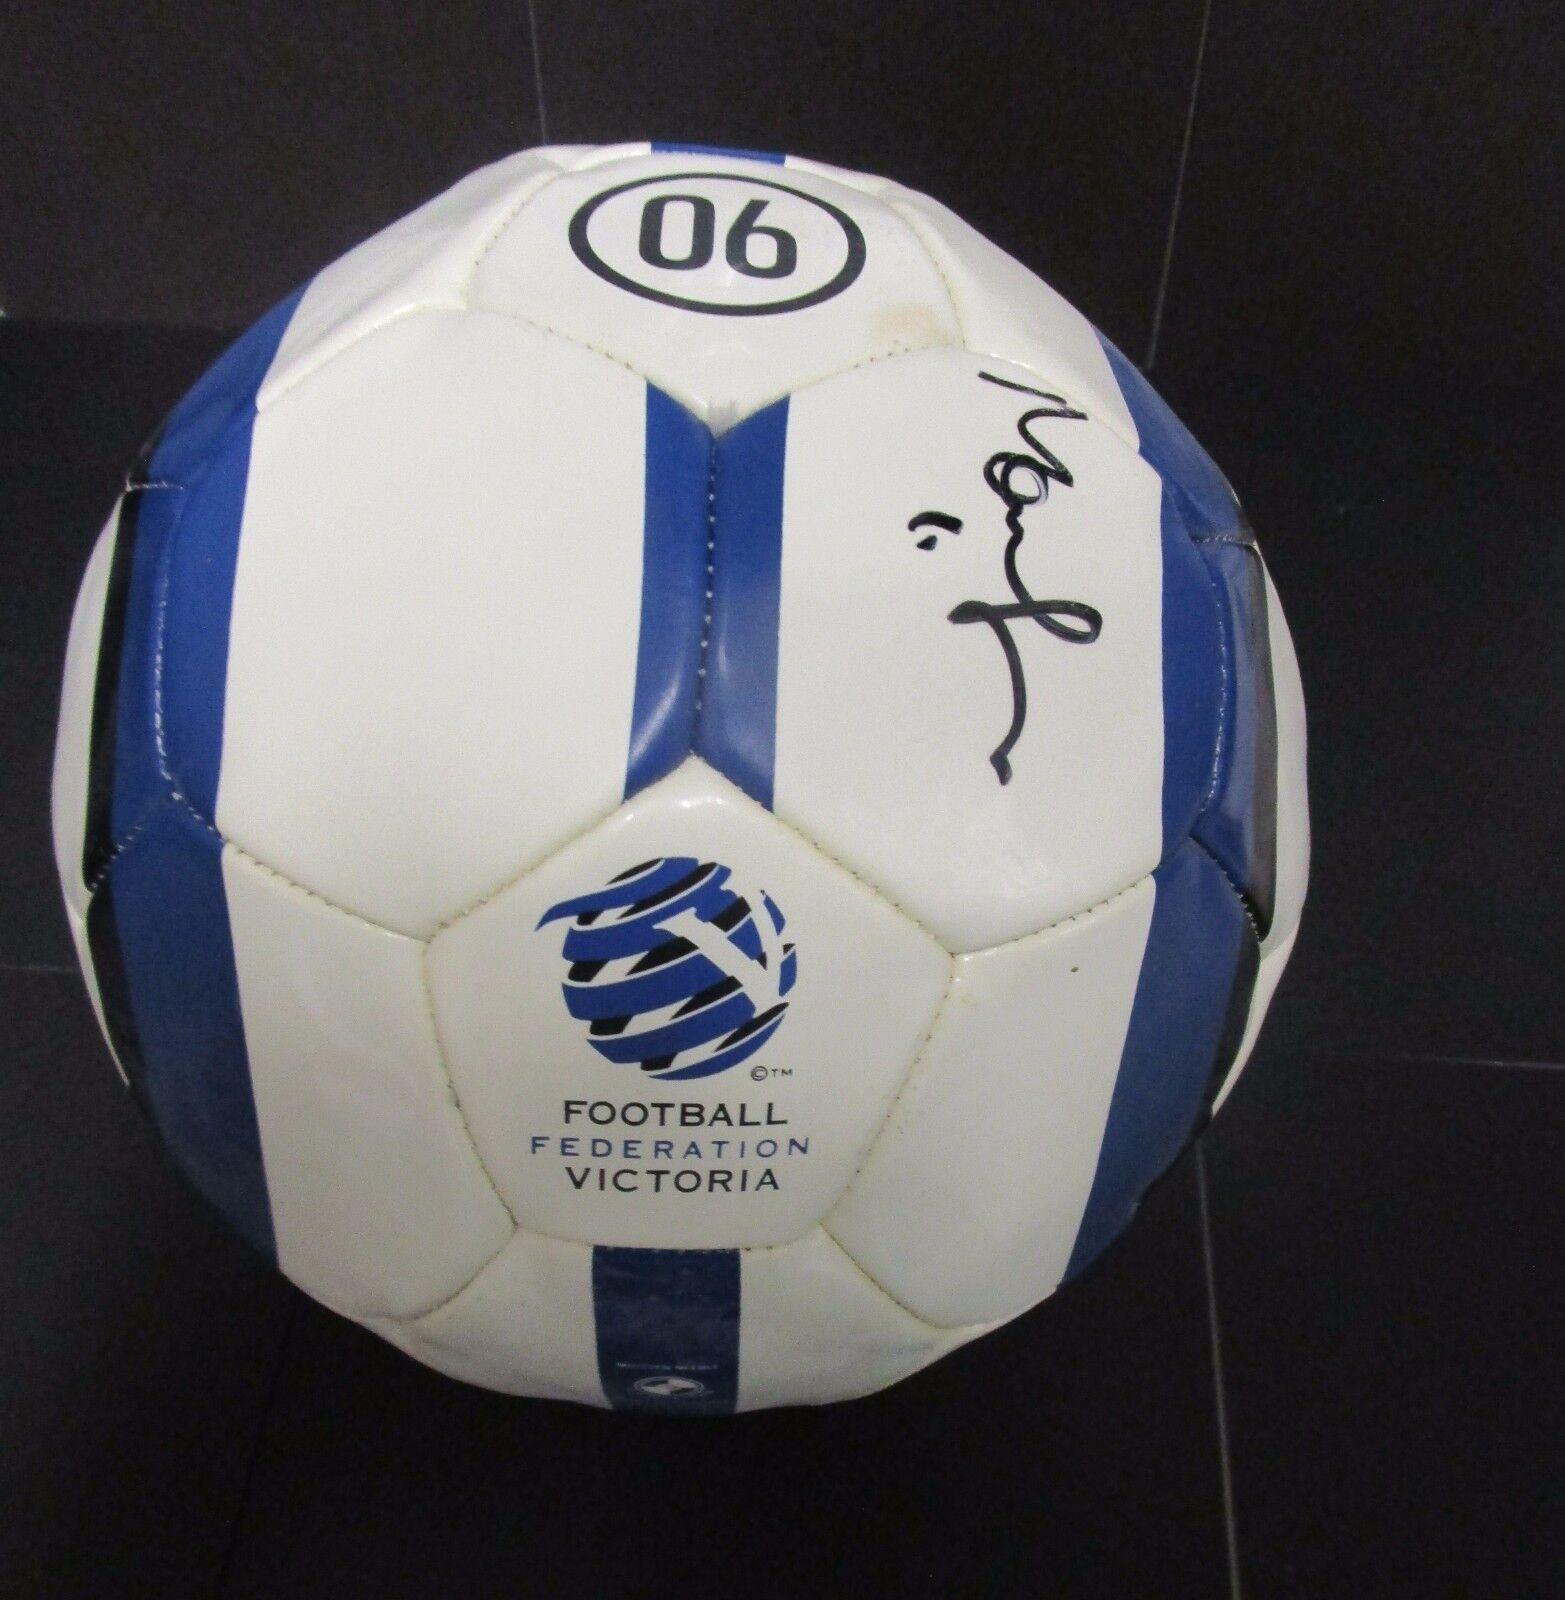 Australia-Mark negroer mano firmada federación de fútbol fútbol victoria